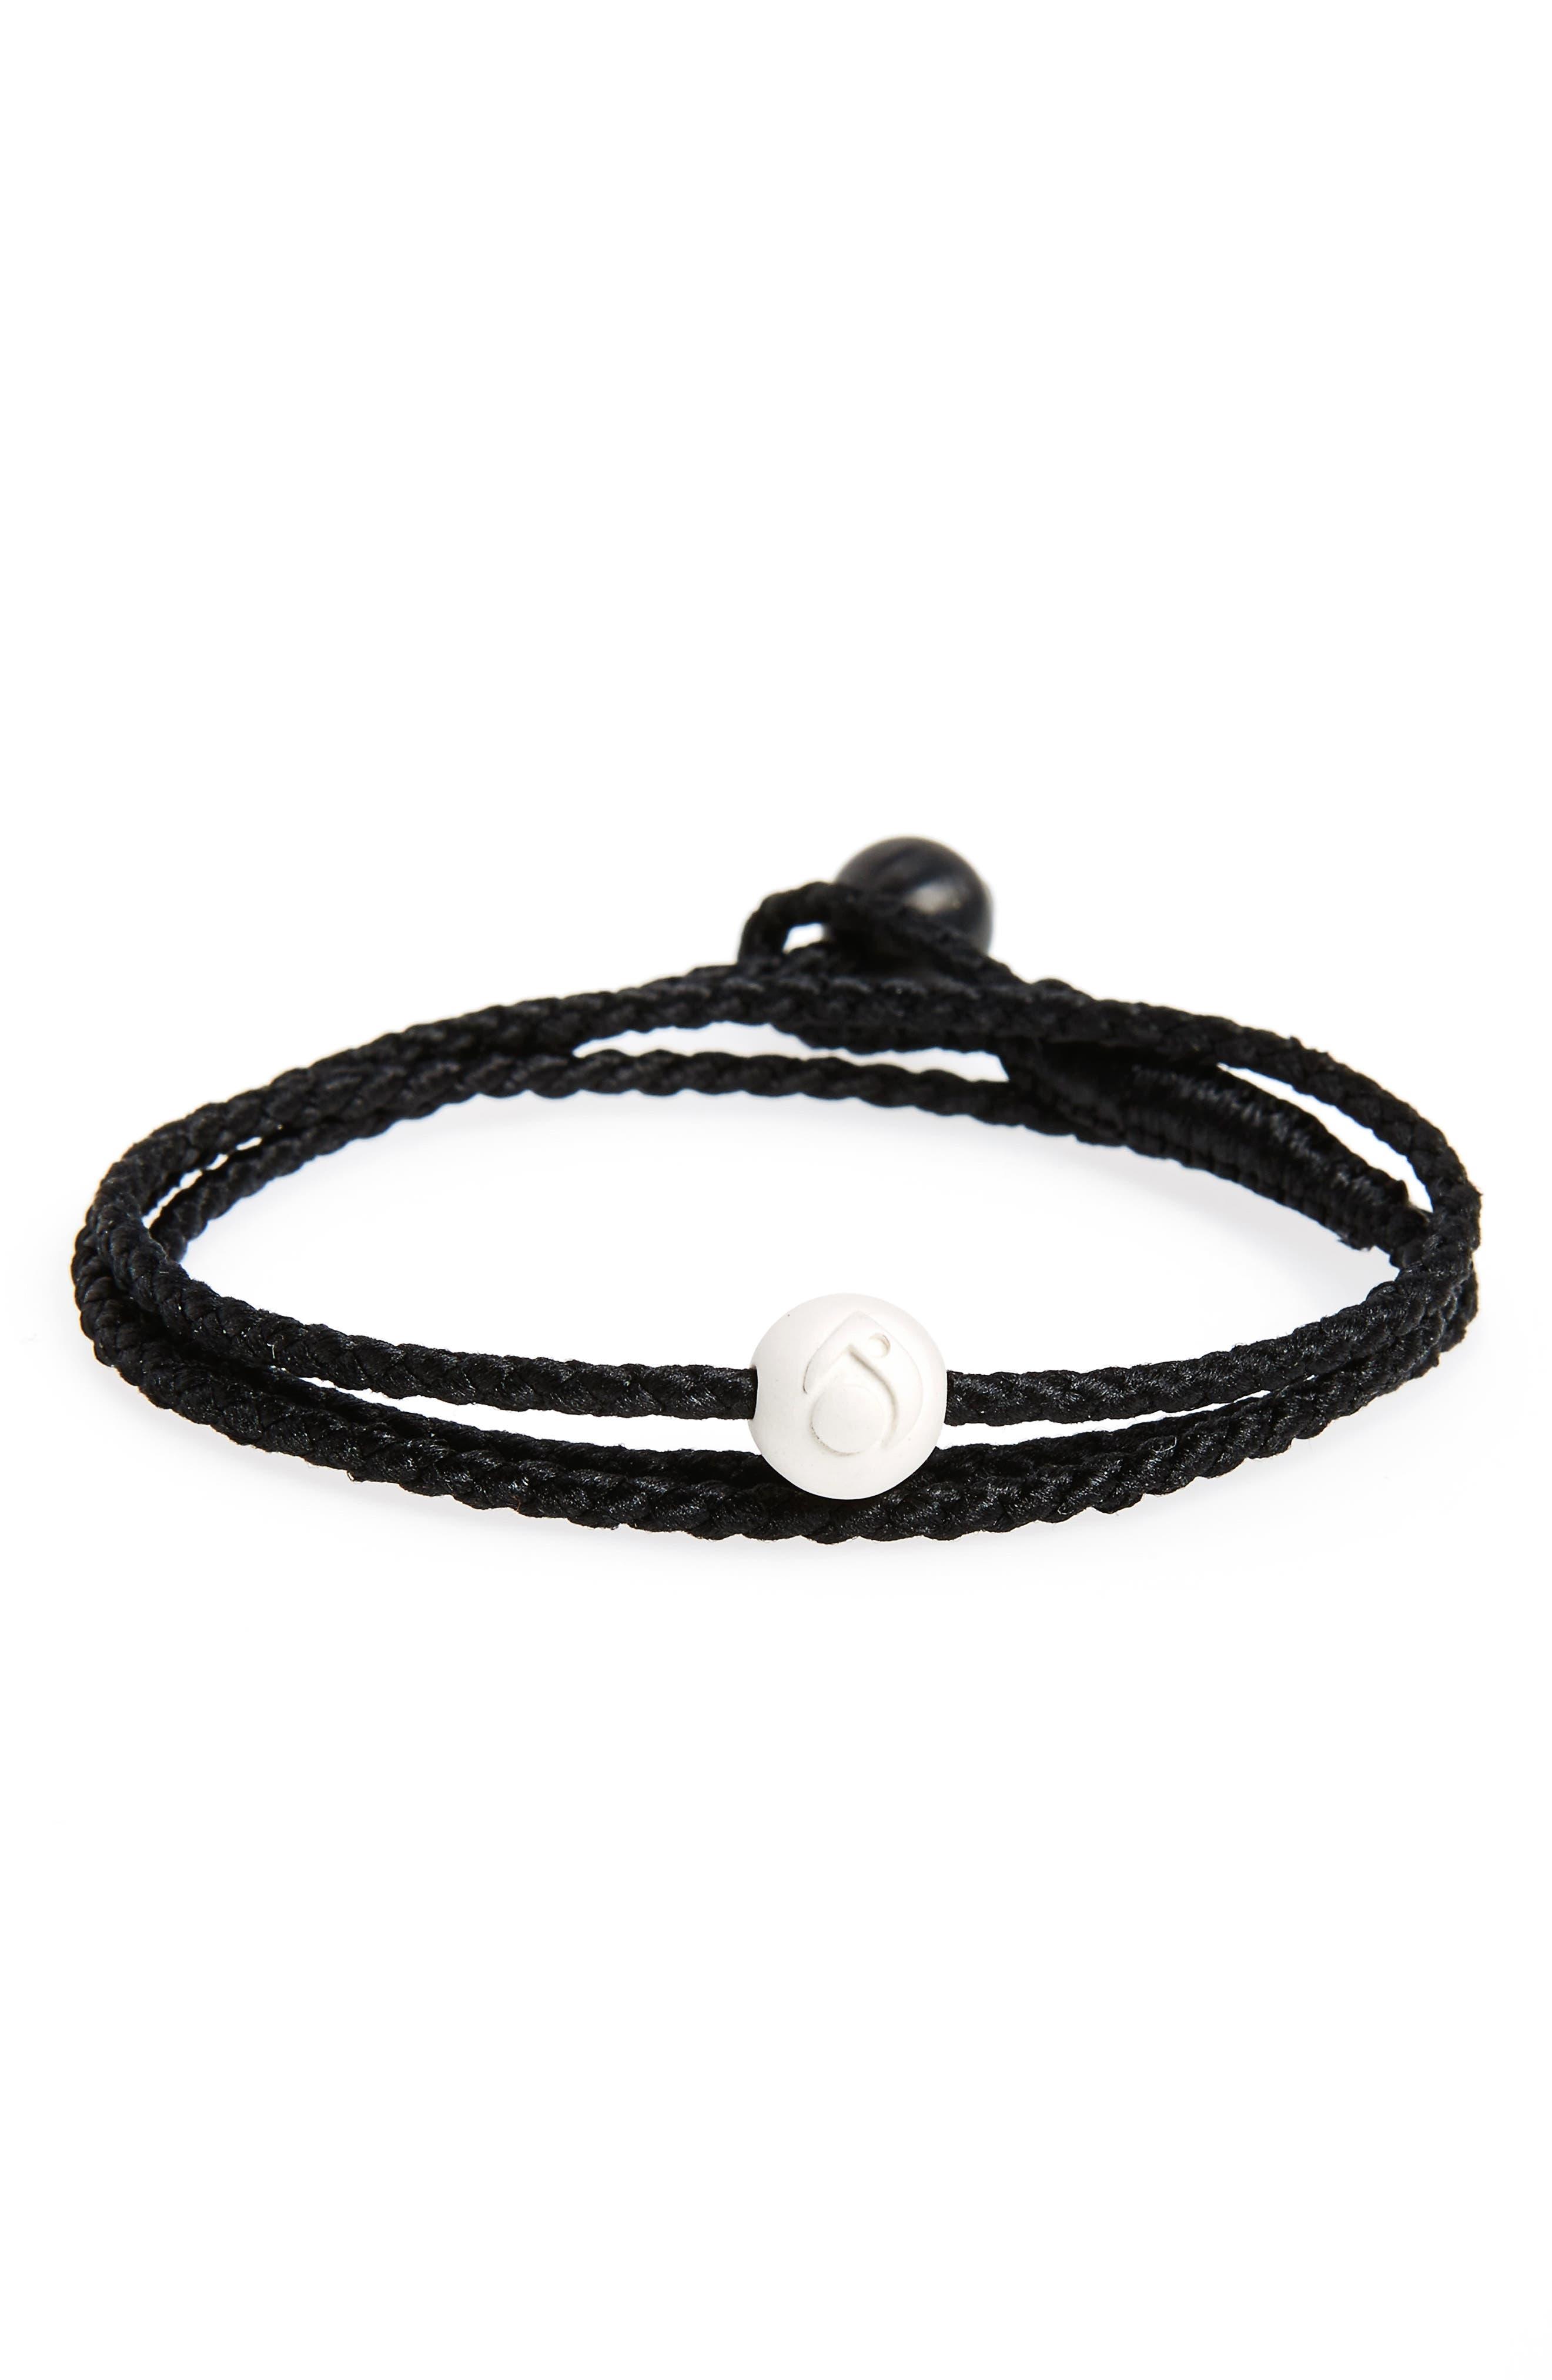 Alternate Image 1 Selected - Lokai Triple Wrap Bracelet